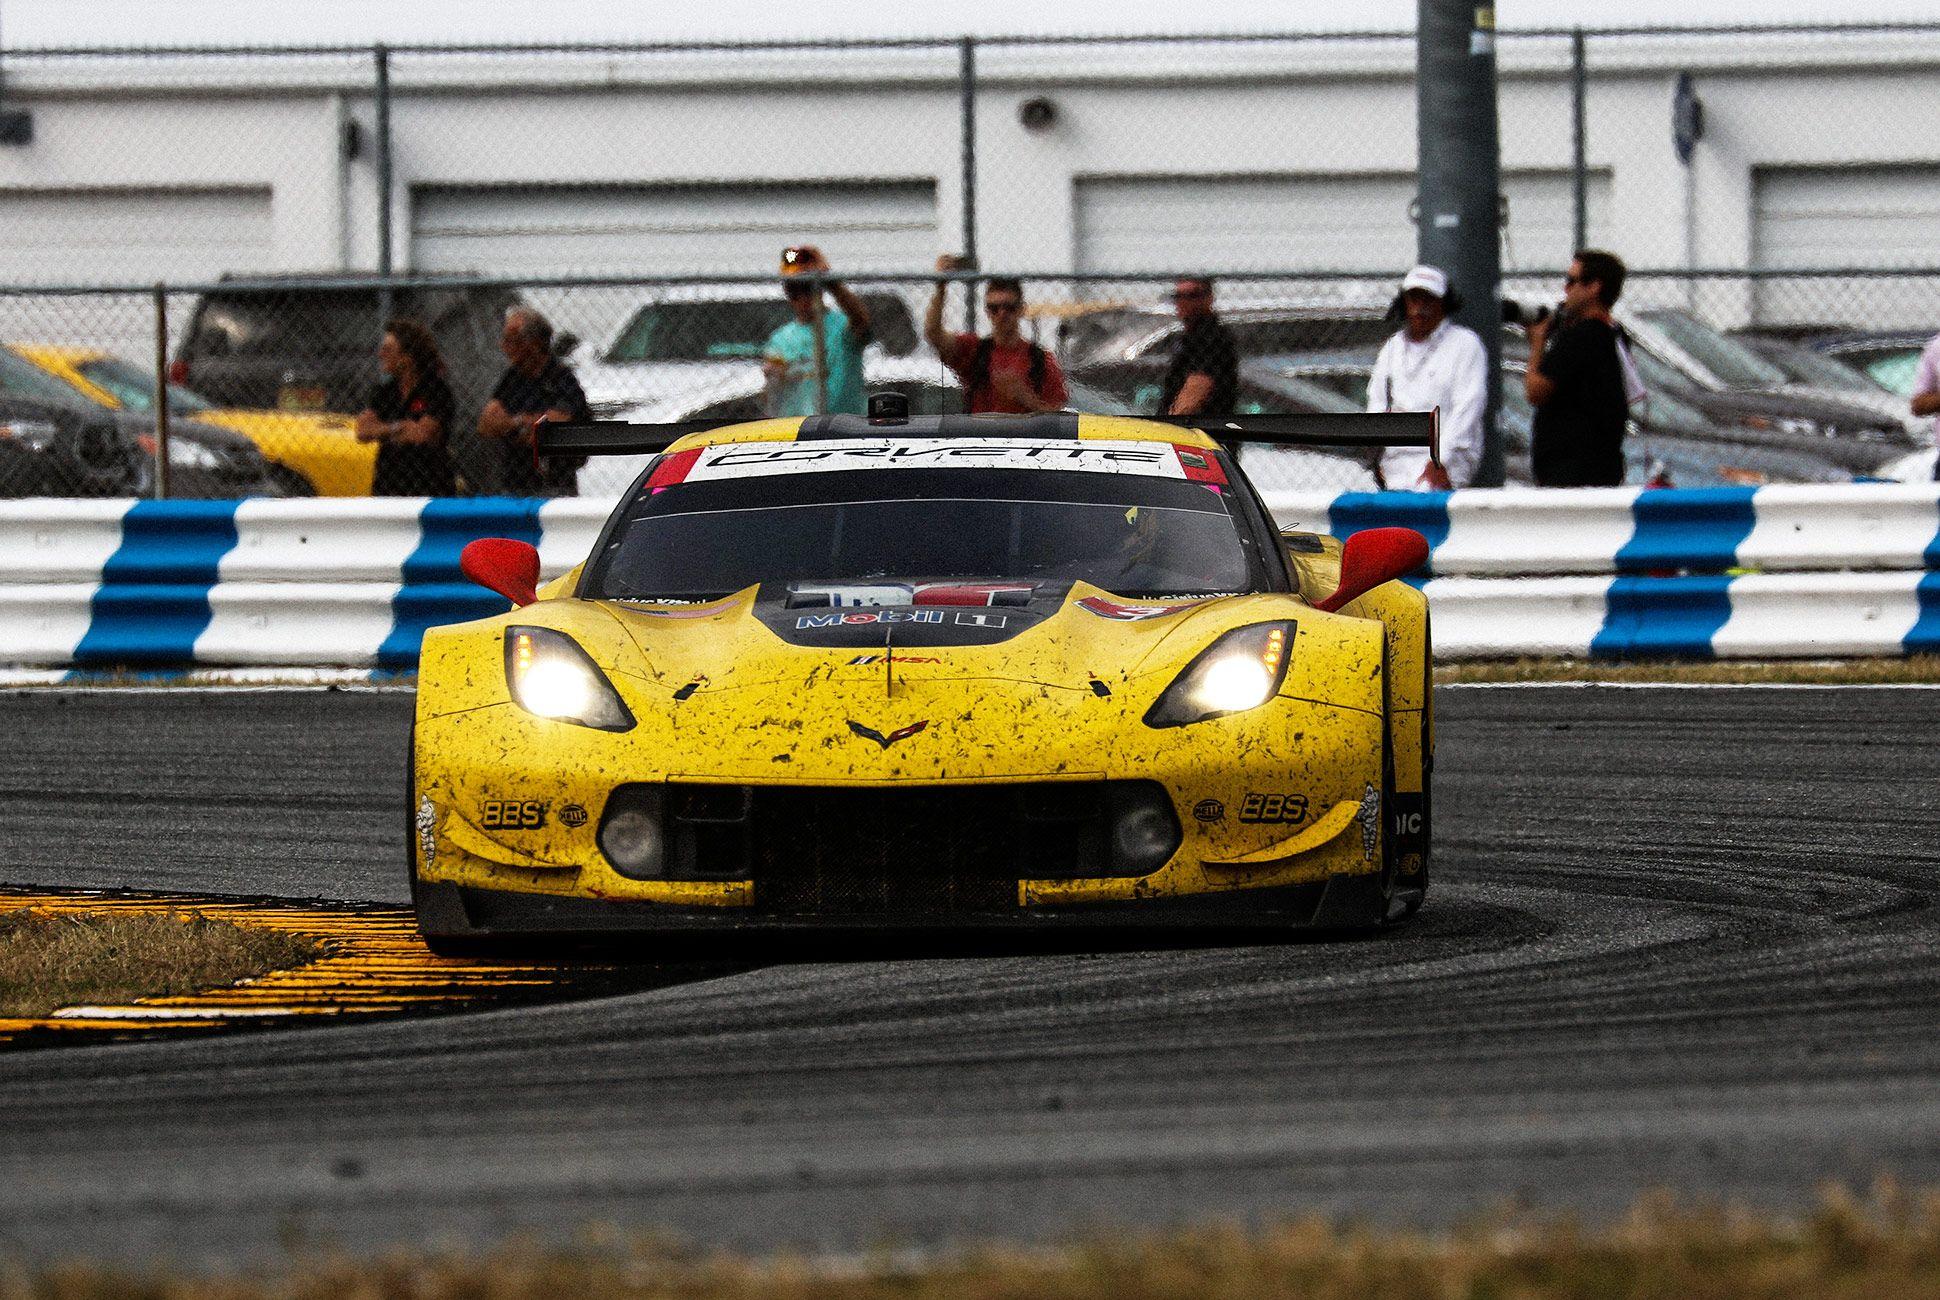 Best-Sports-Cars-of-2018-Daytona-24-Hours-gear-patrol-Corvette-C7R-1